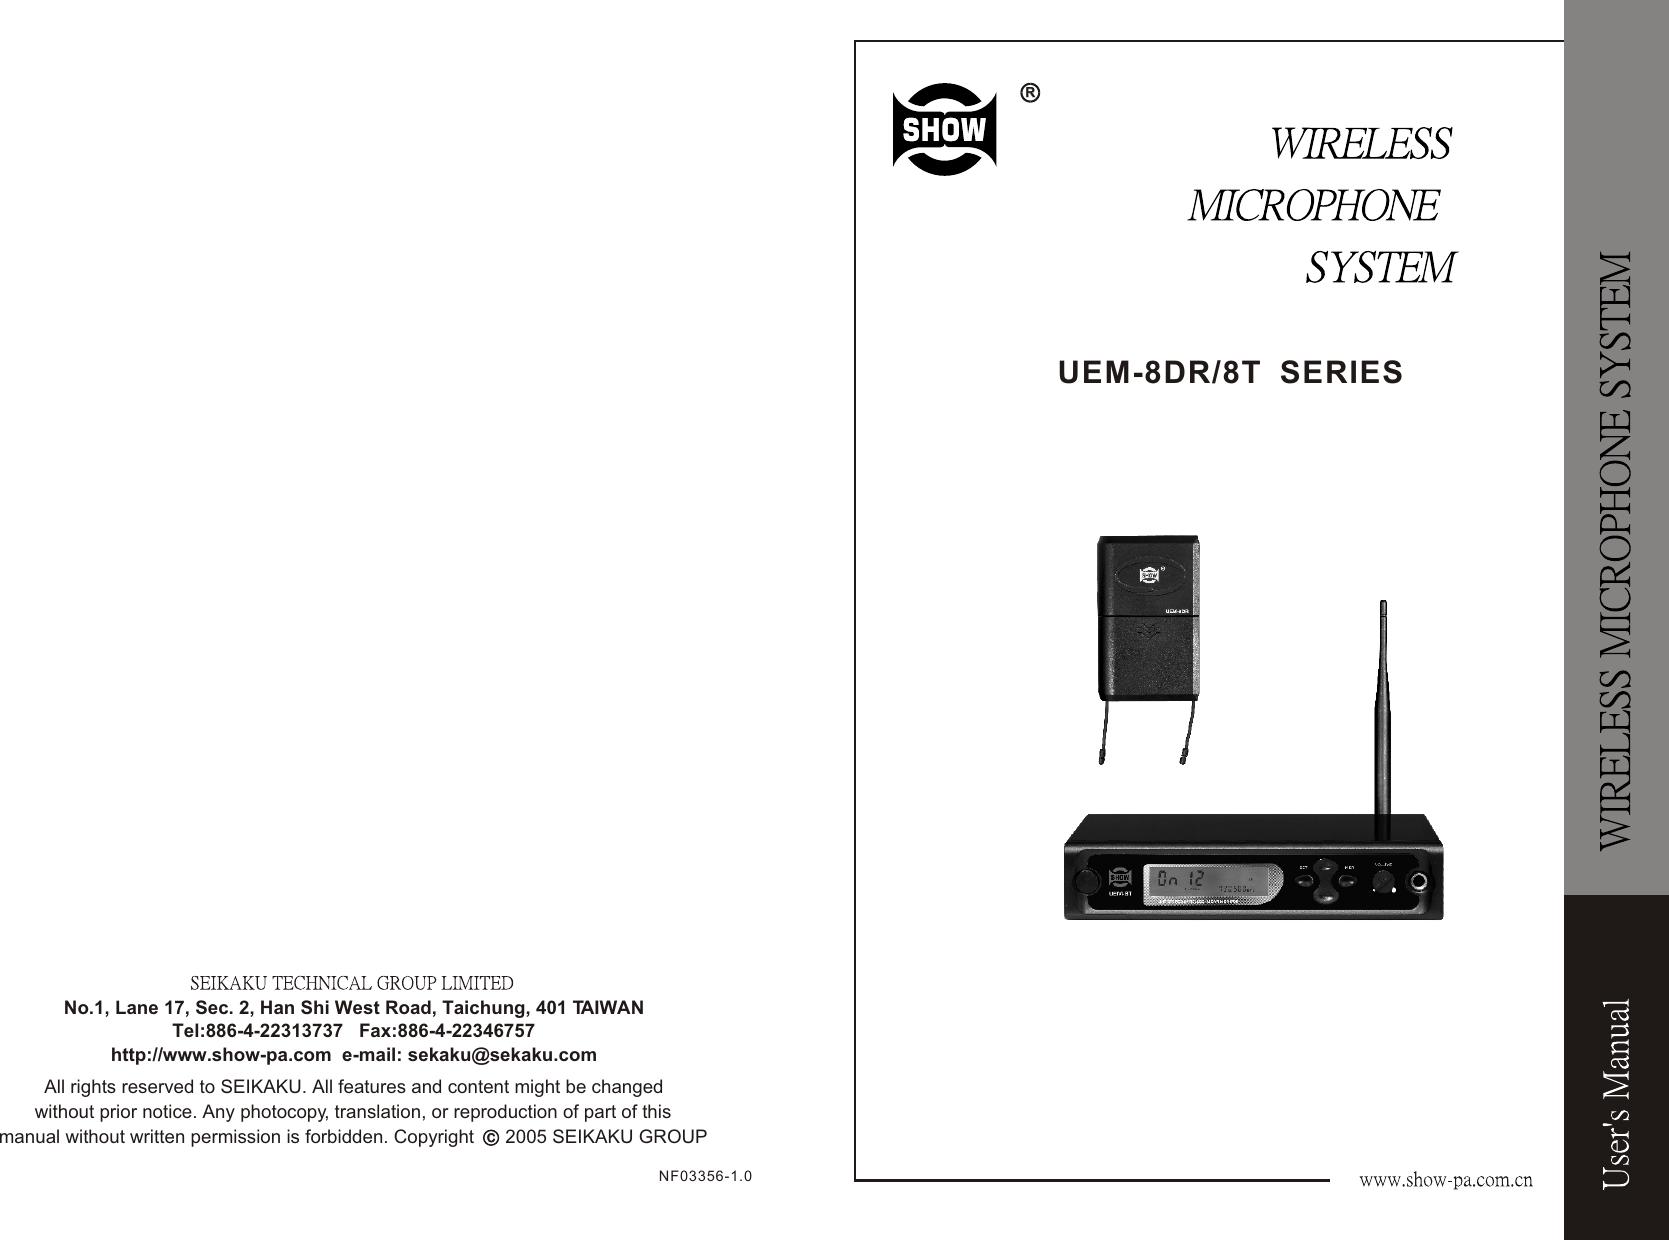 SEIKAKU TECHNICAL GROUP UEM-8T Wireless Microphone System User